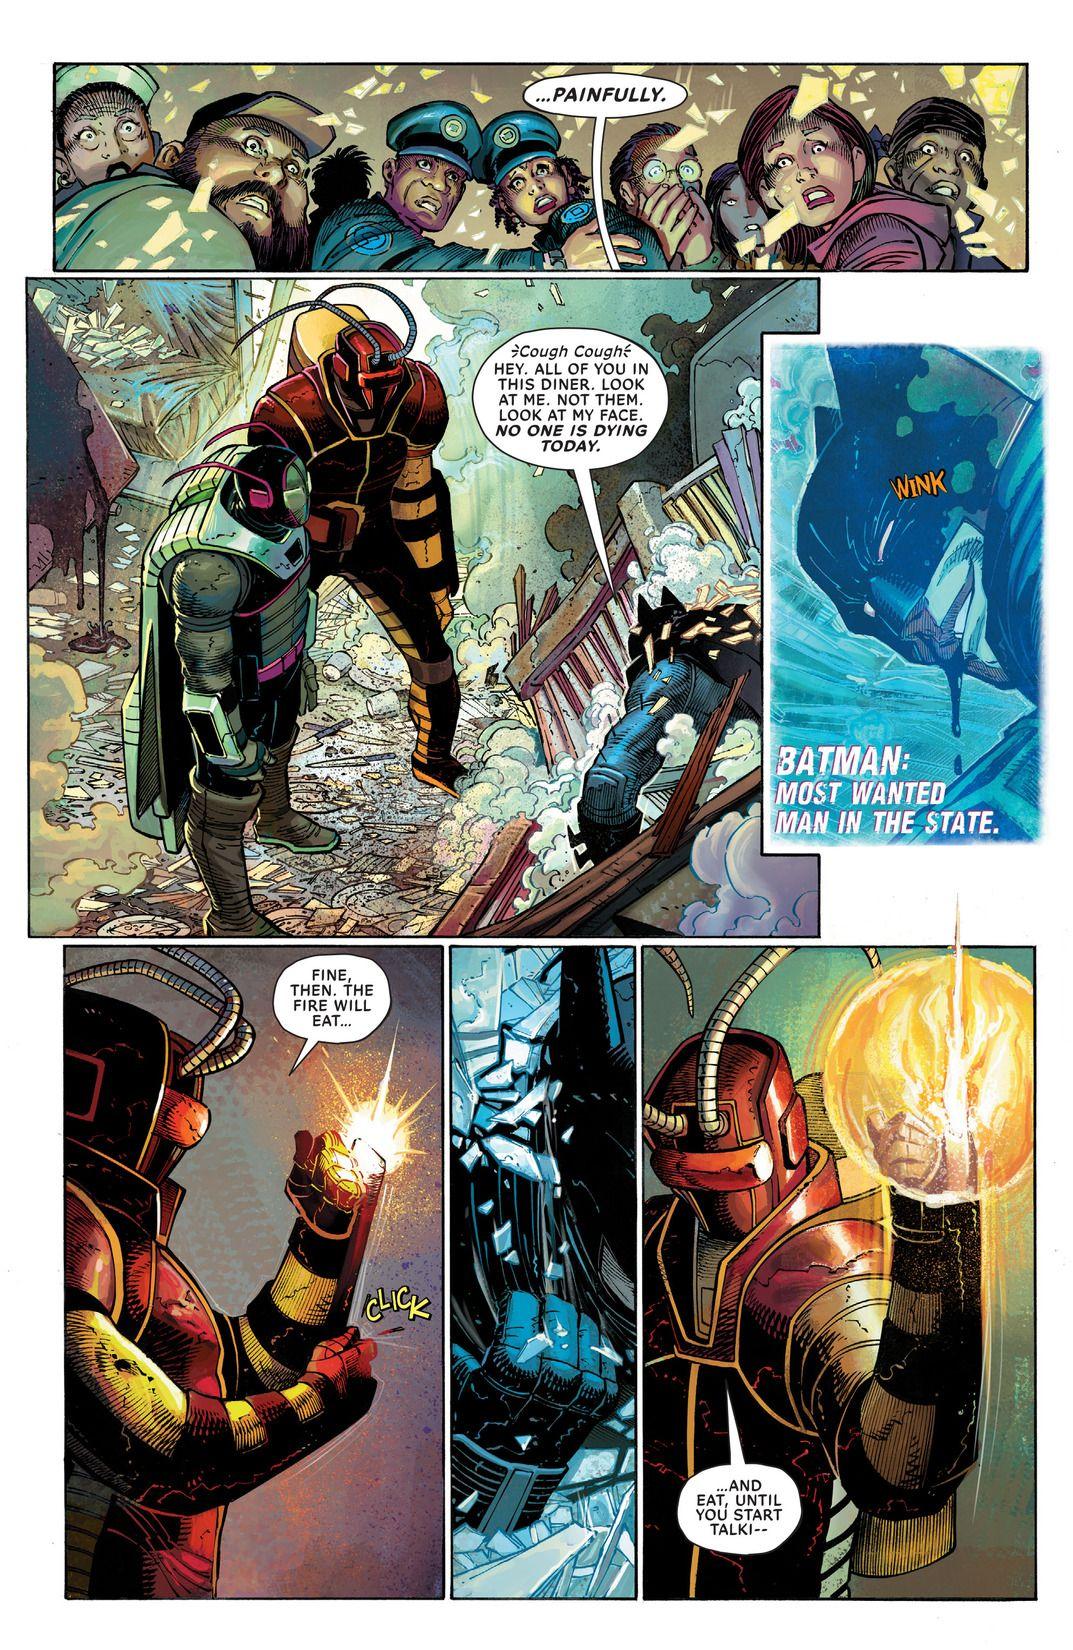 'All-Star Batman' #1 art by Danny Miki, Joride Bellaire, John Romita Jr. & Dean White